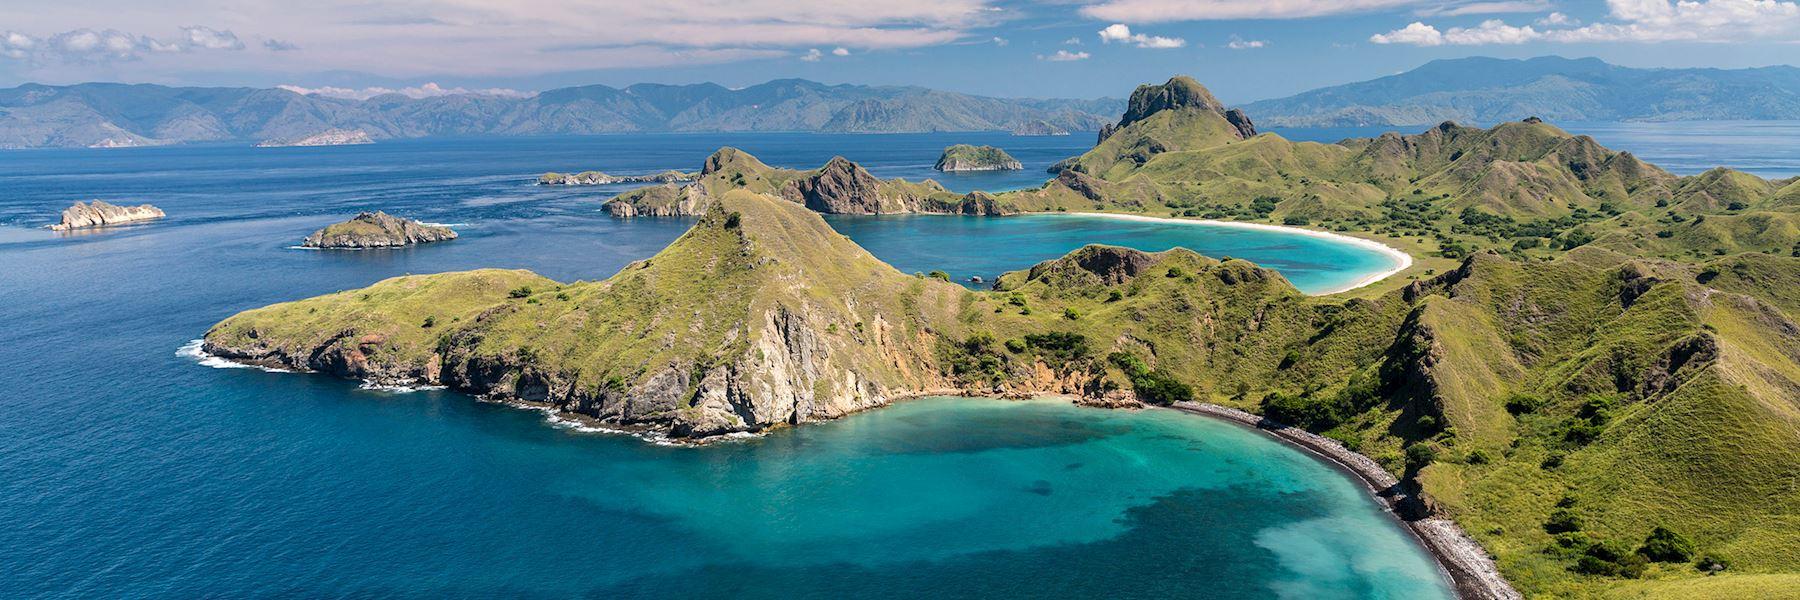 Indonesia Cruises Audley Travel